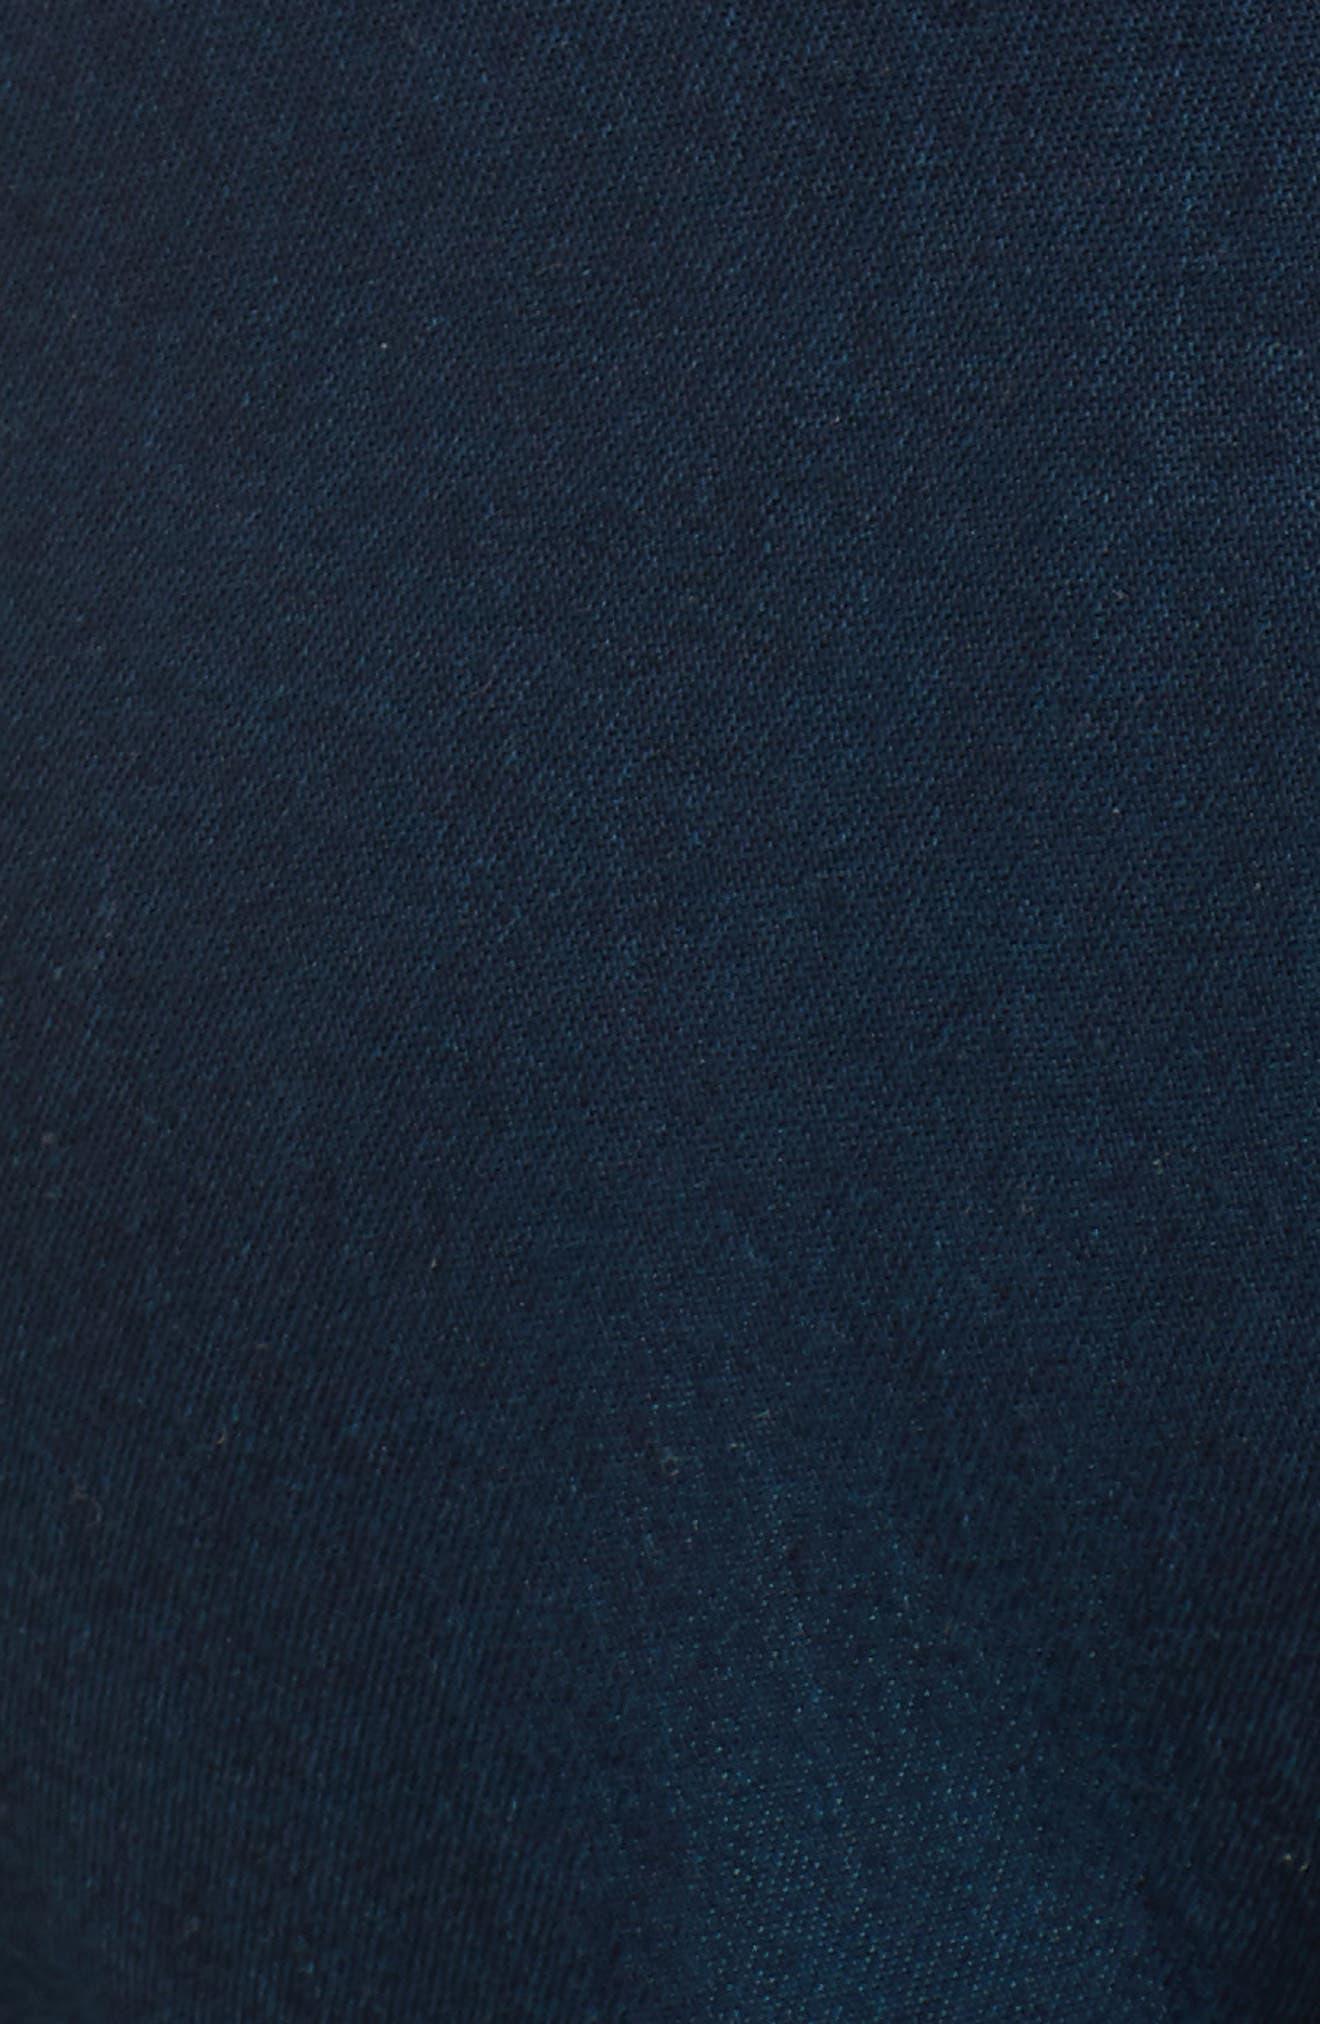 Elizabeth & Kenmare Shirtdress,                             Alternate thumbnail 5, color,                             405